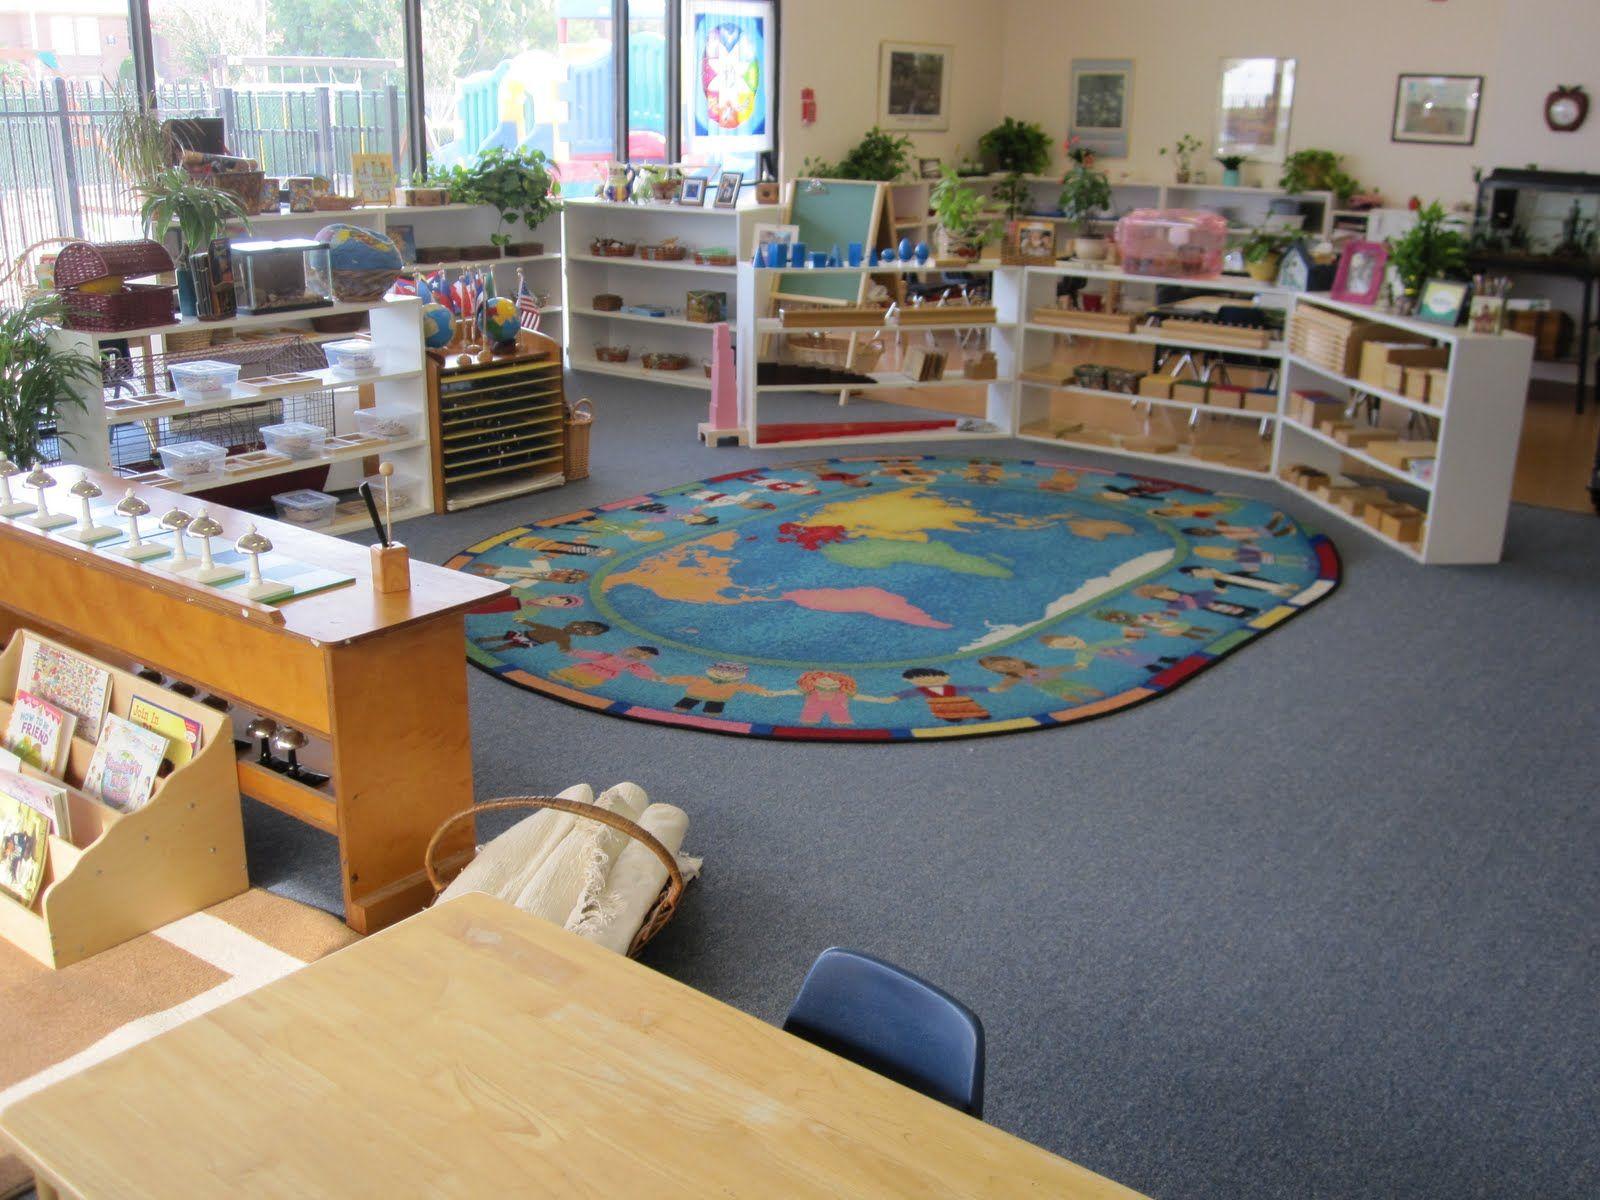 Pre-Kindergarten Classroom Decorating Ideas